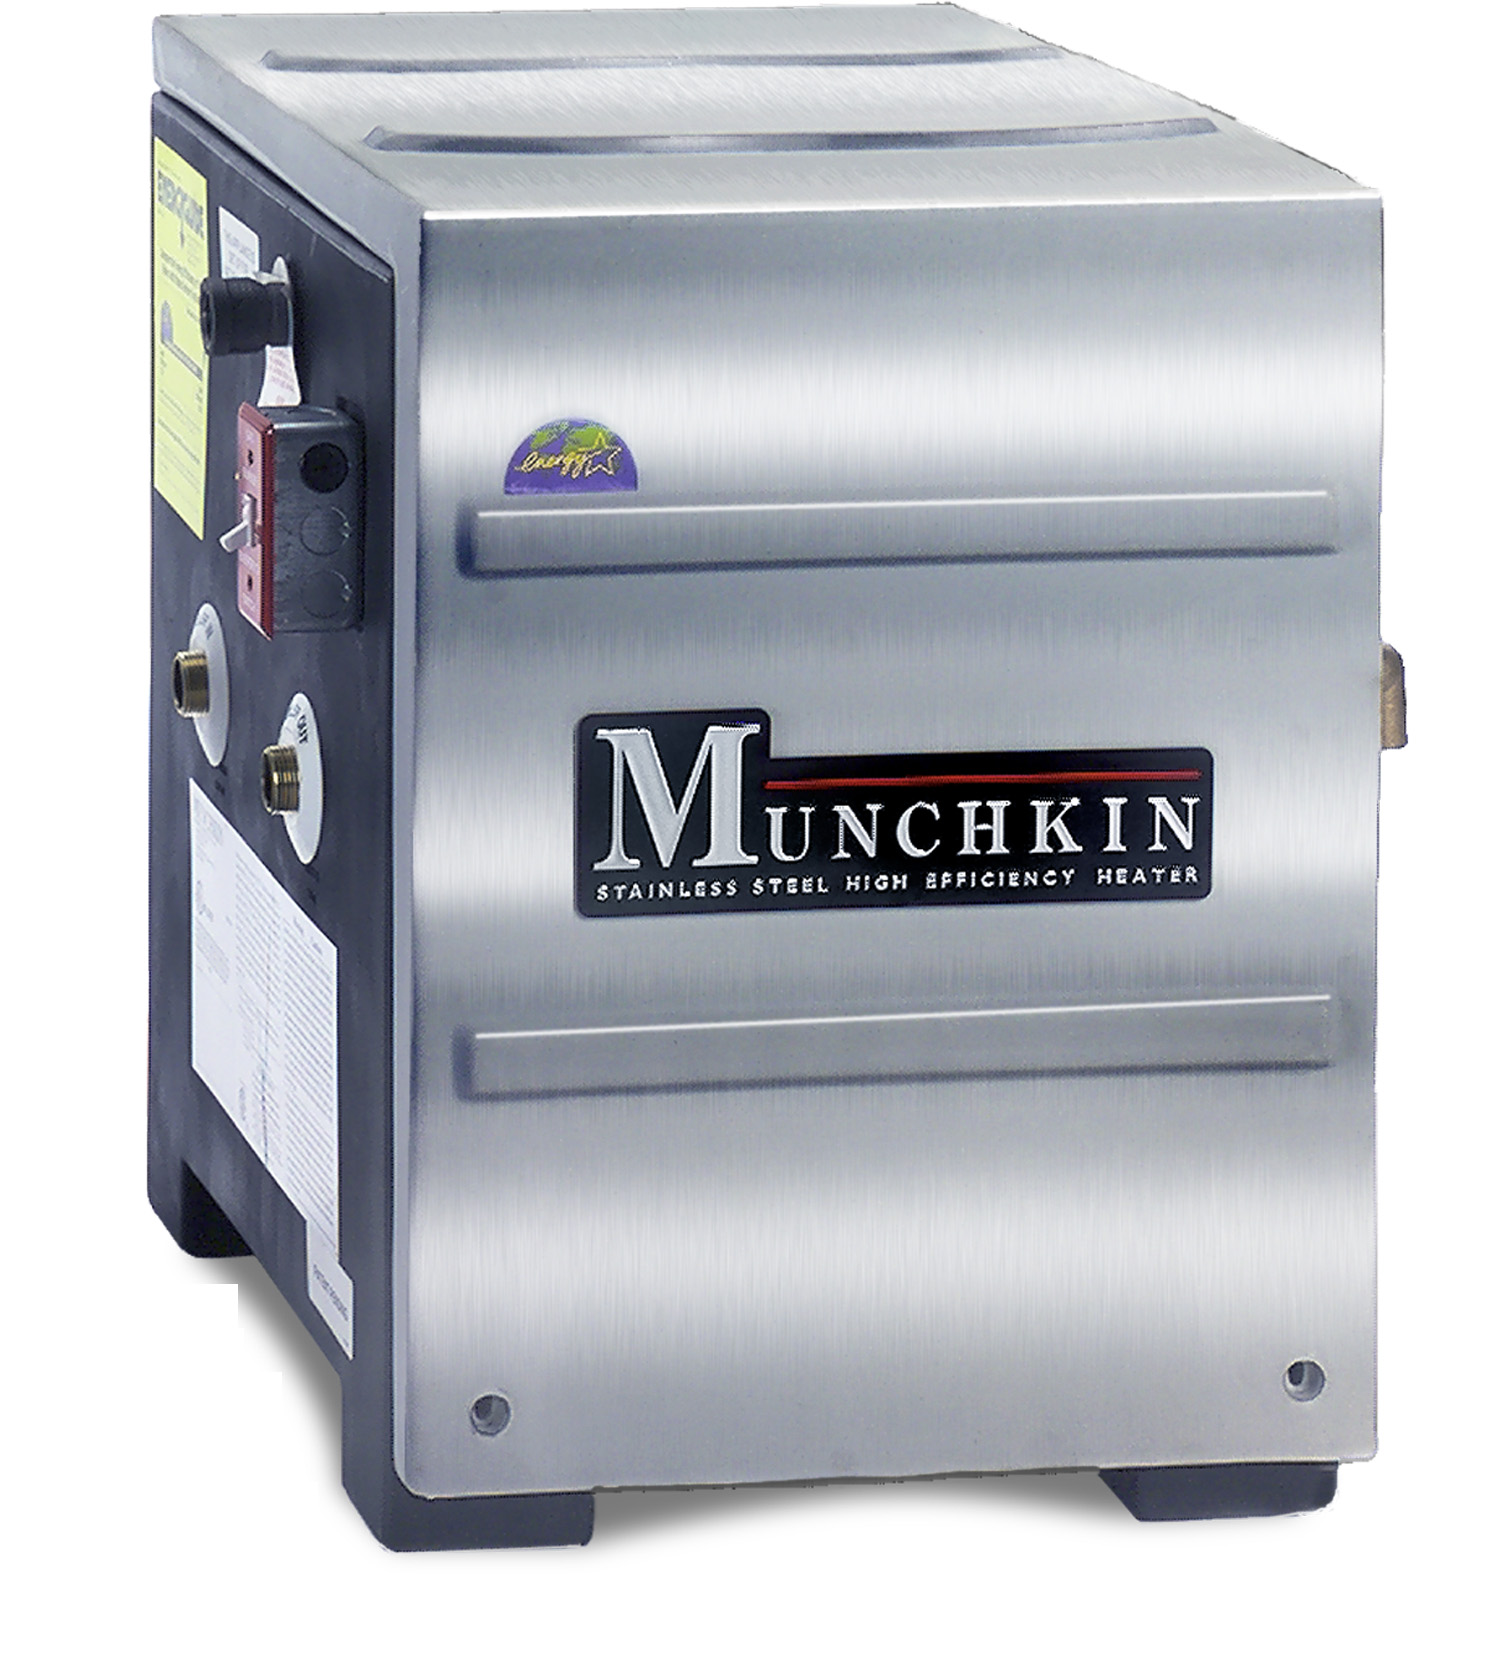 Media Kit Commercial Residential Water Heaters Boilers